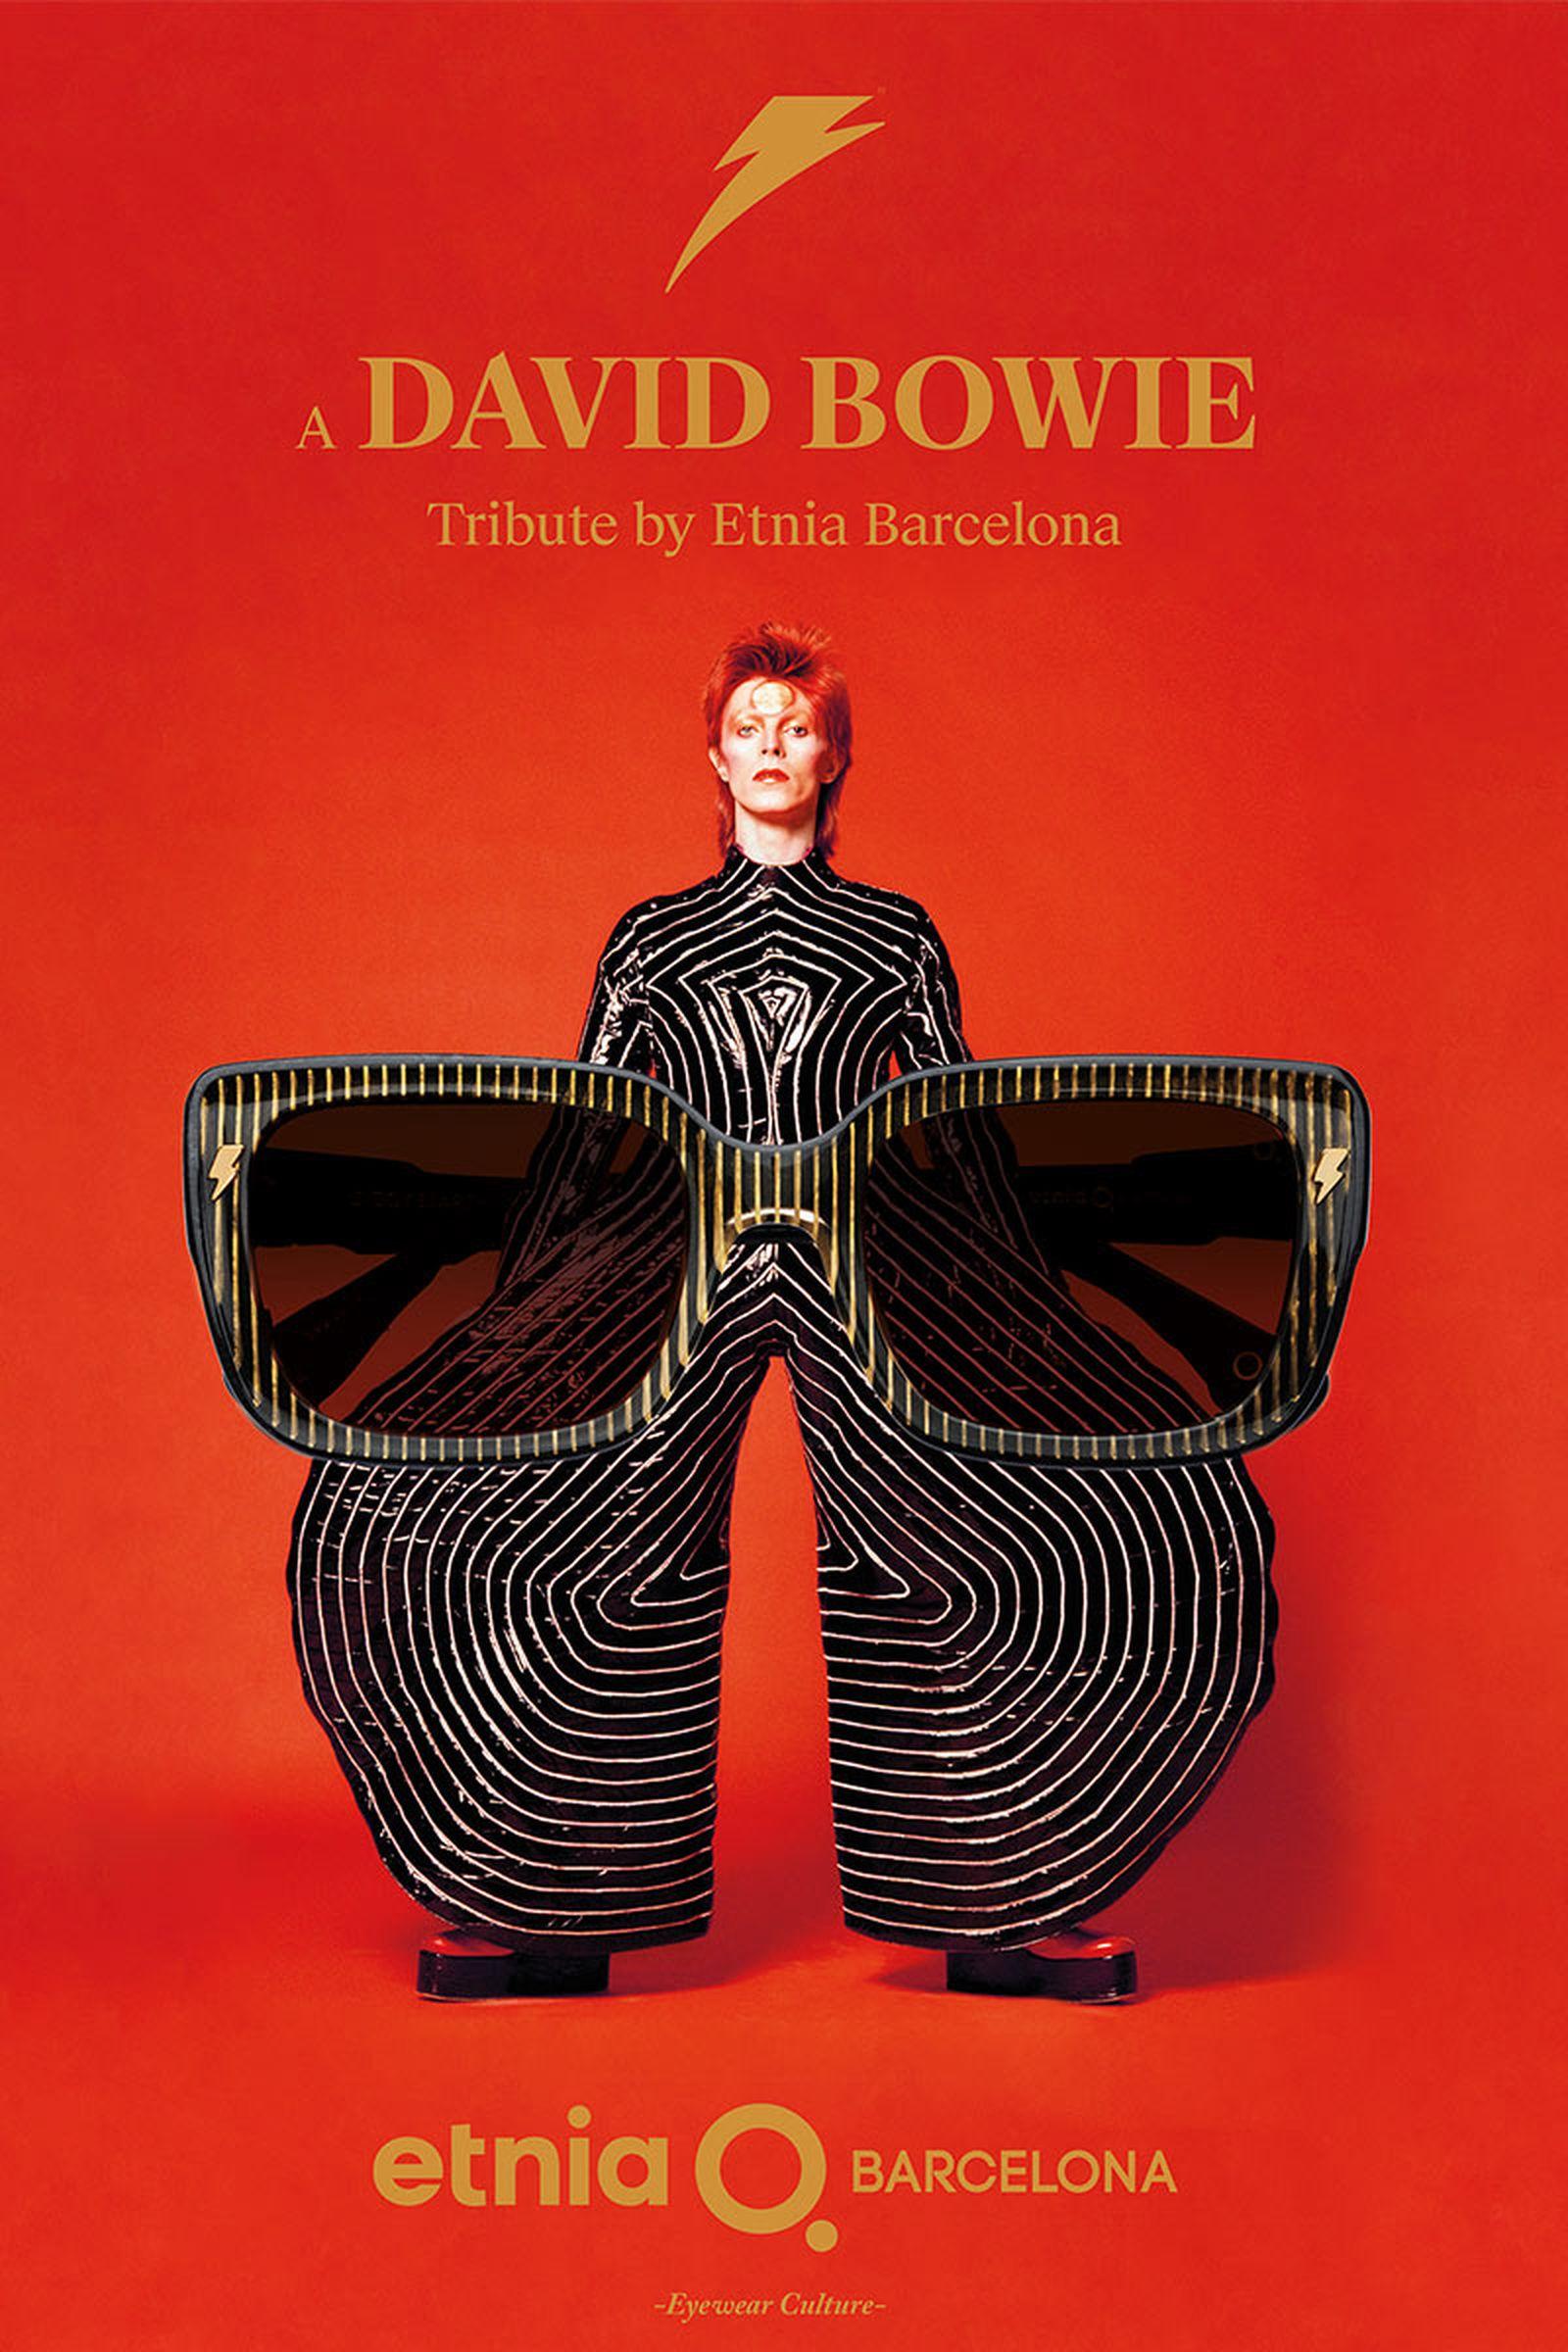 David_Bowie_PortA